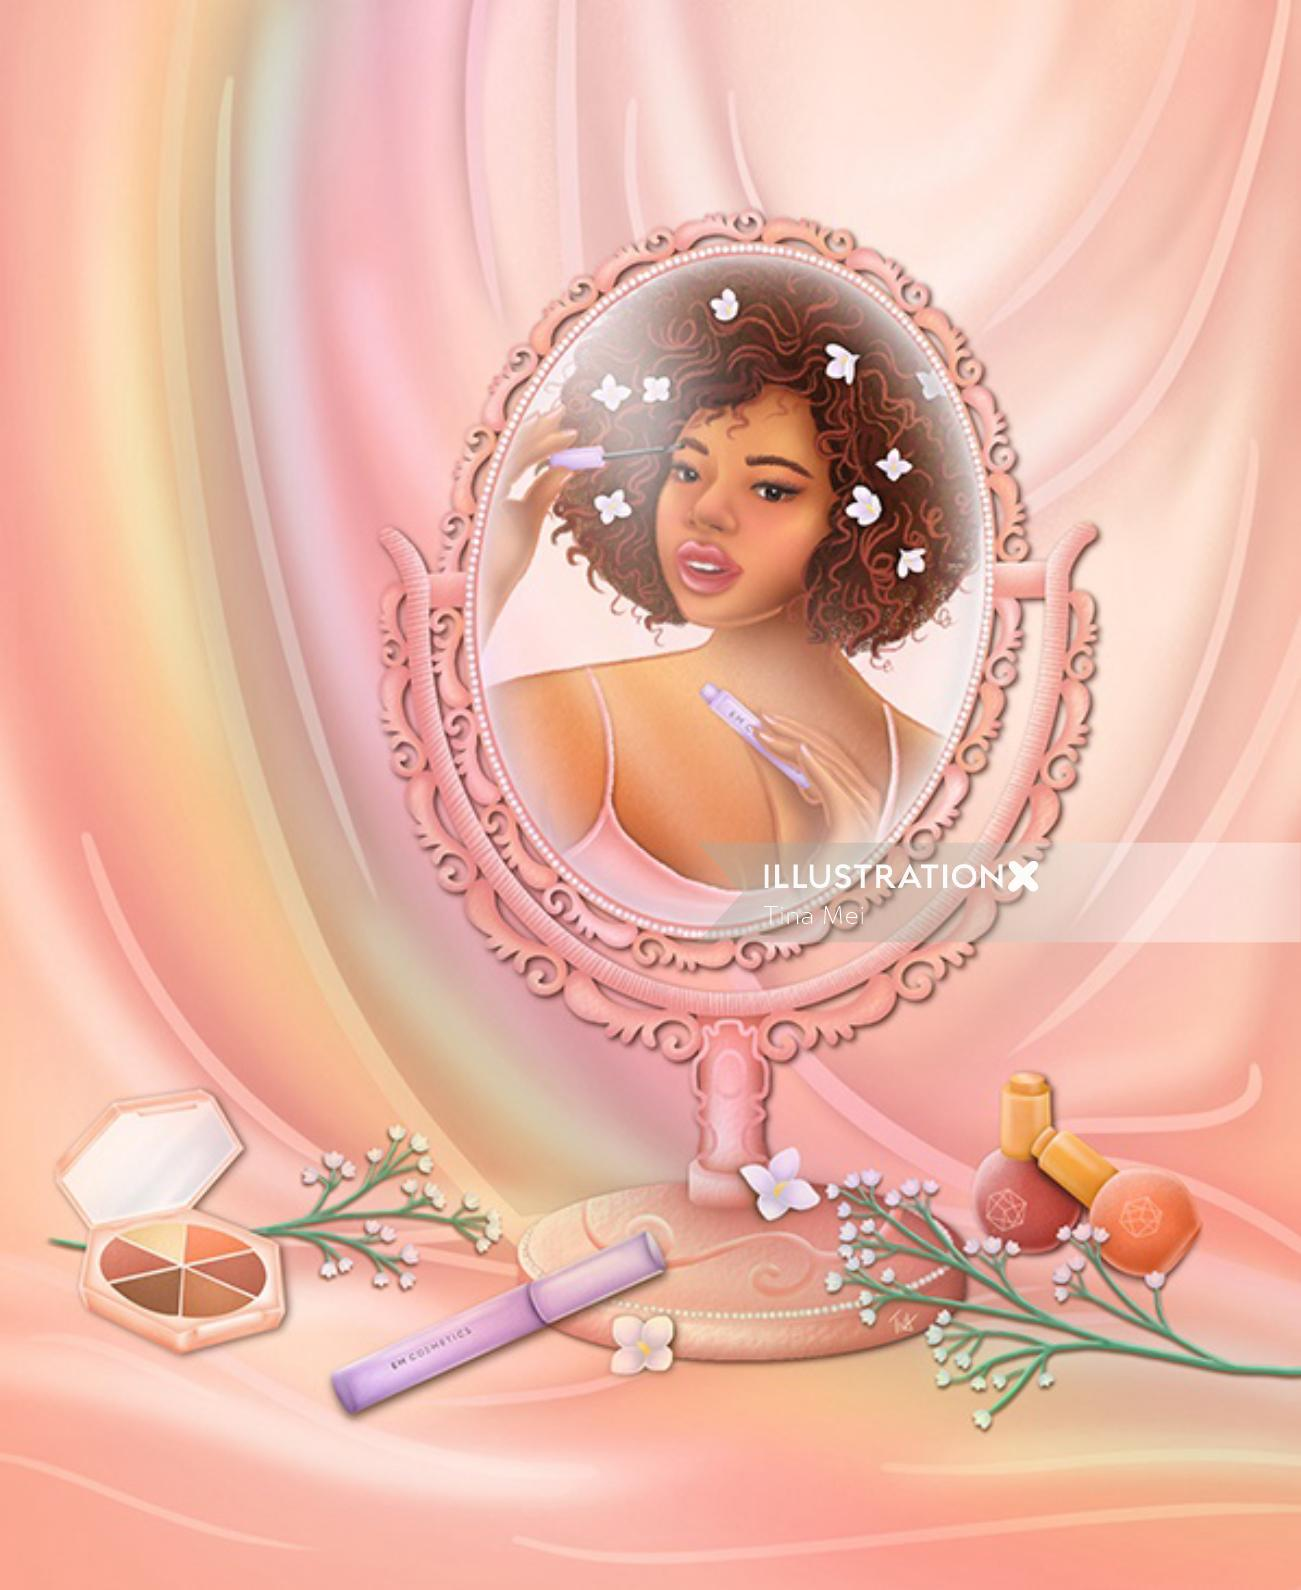 Women's Em Cosmetics beauty products